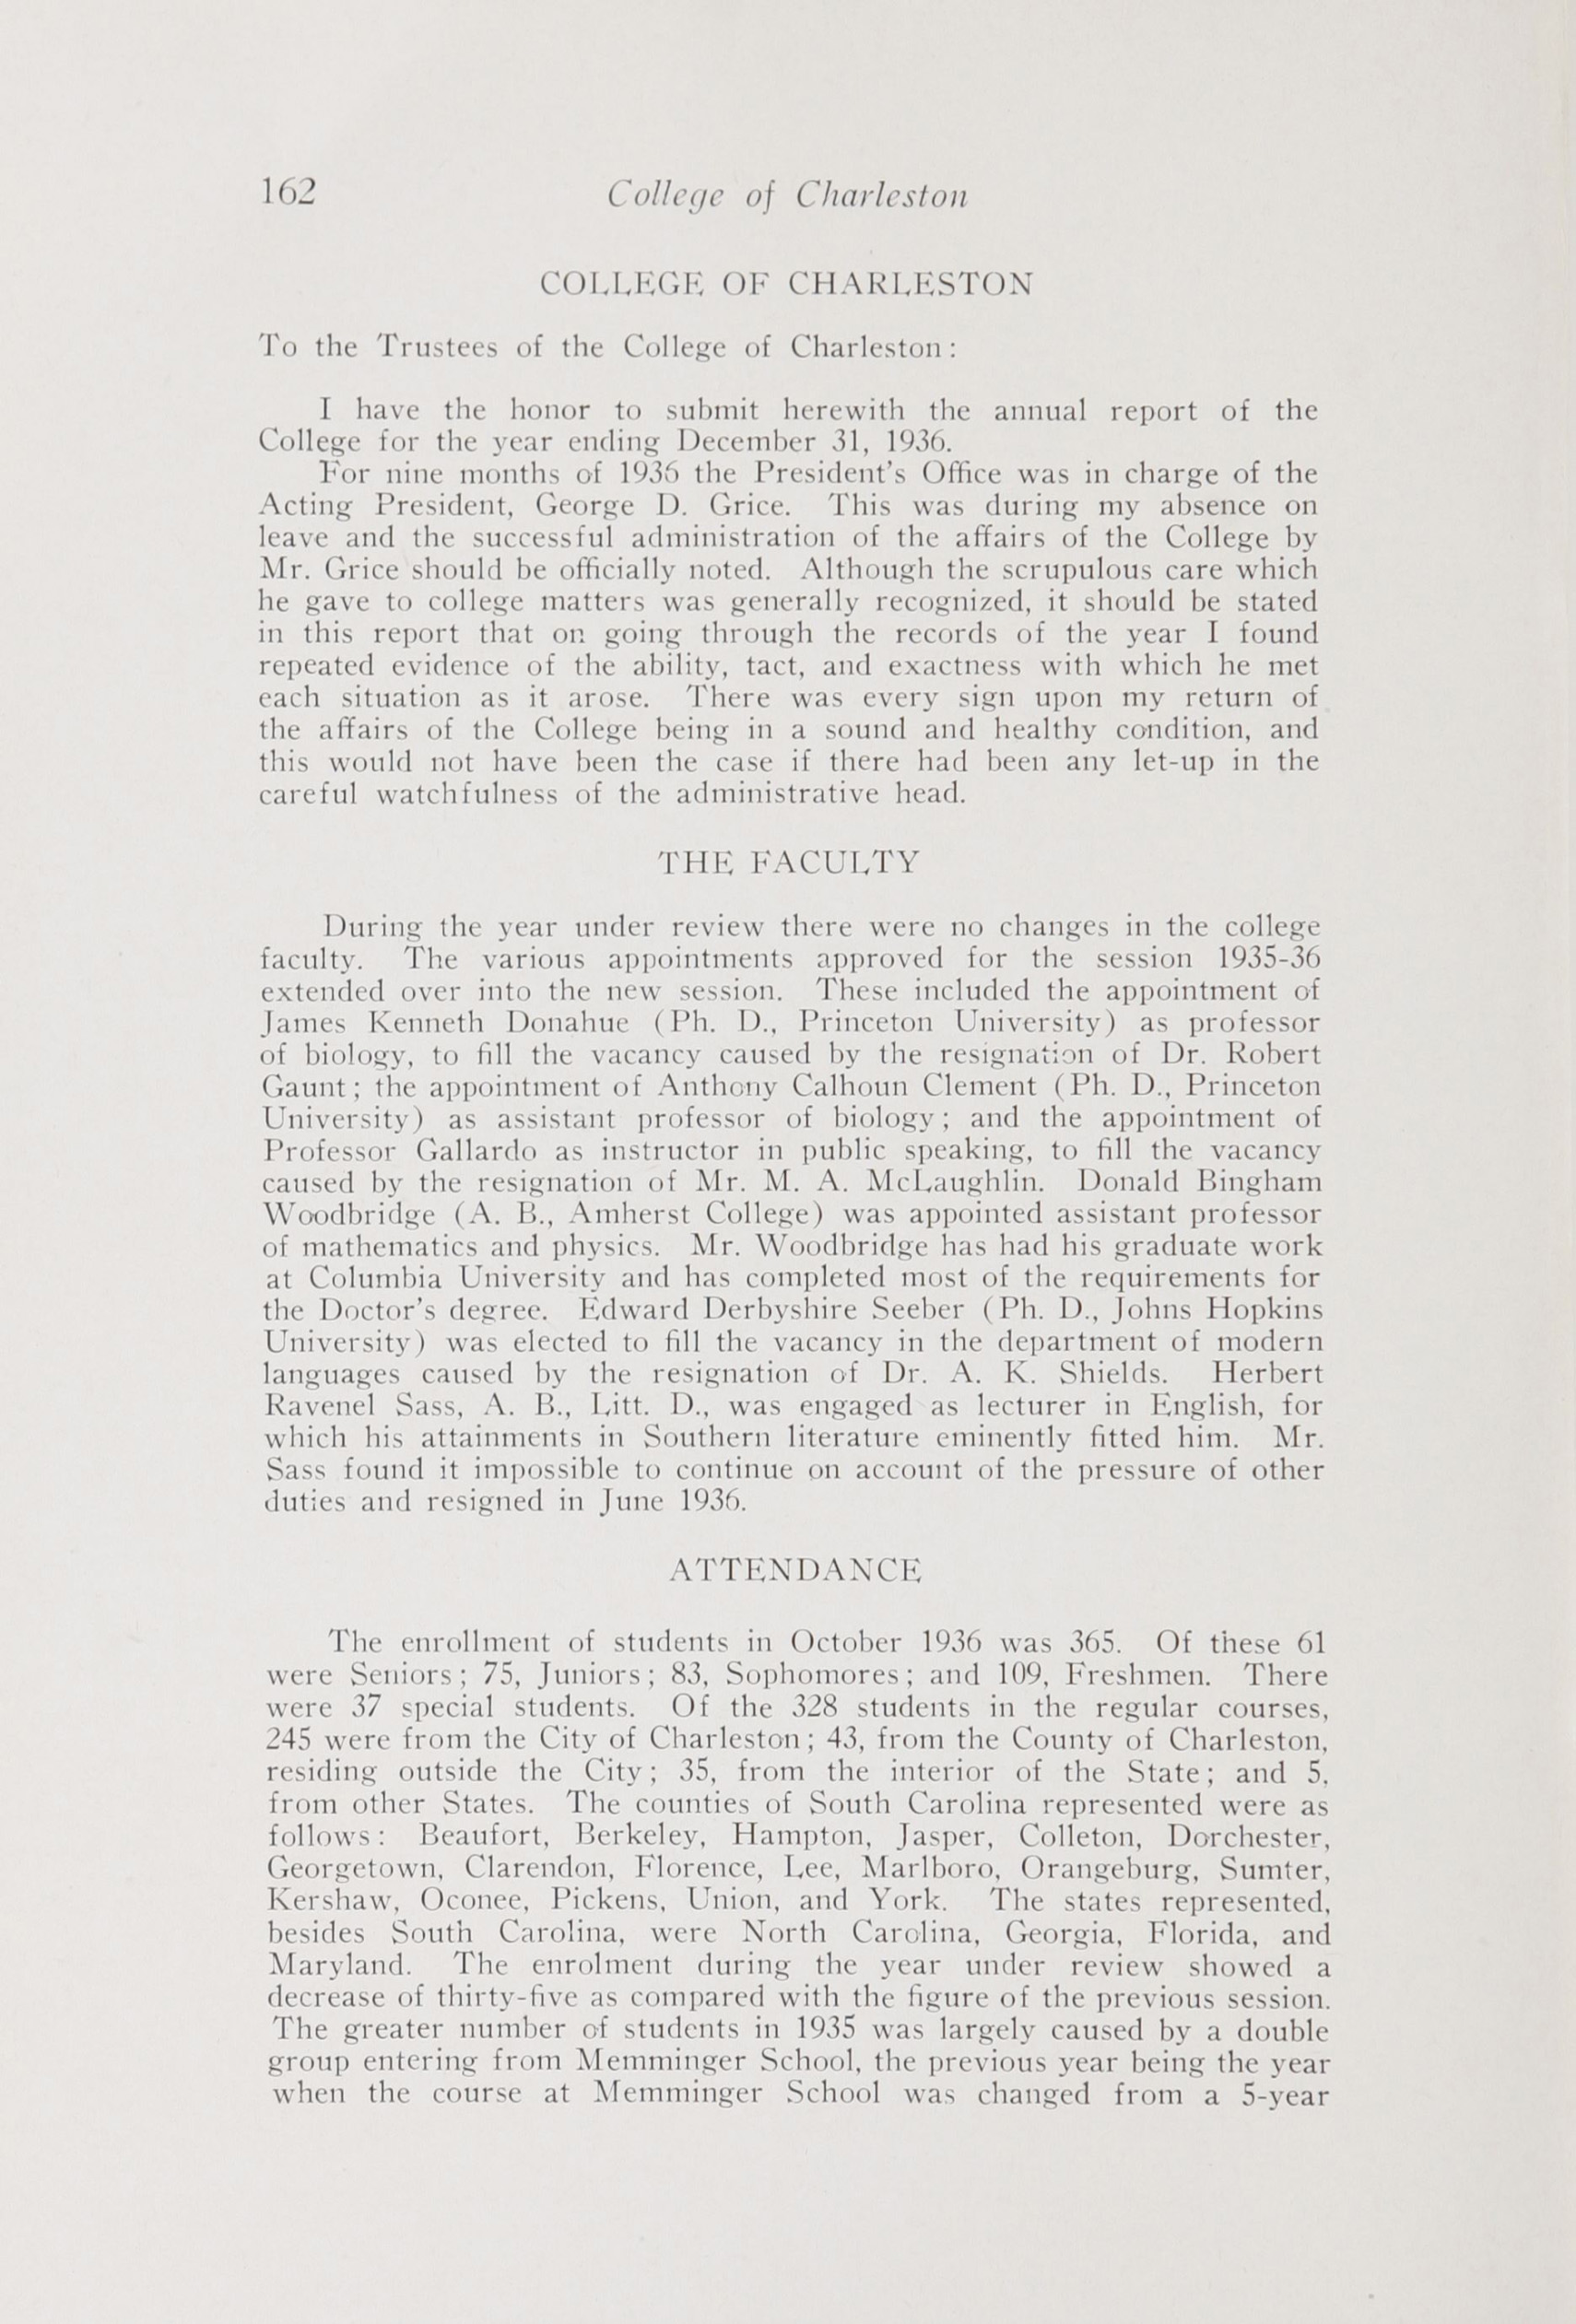 Charleston Yearbook, 1936, page 162